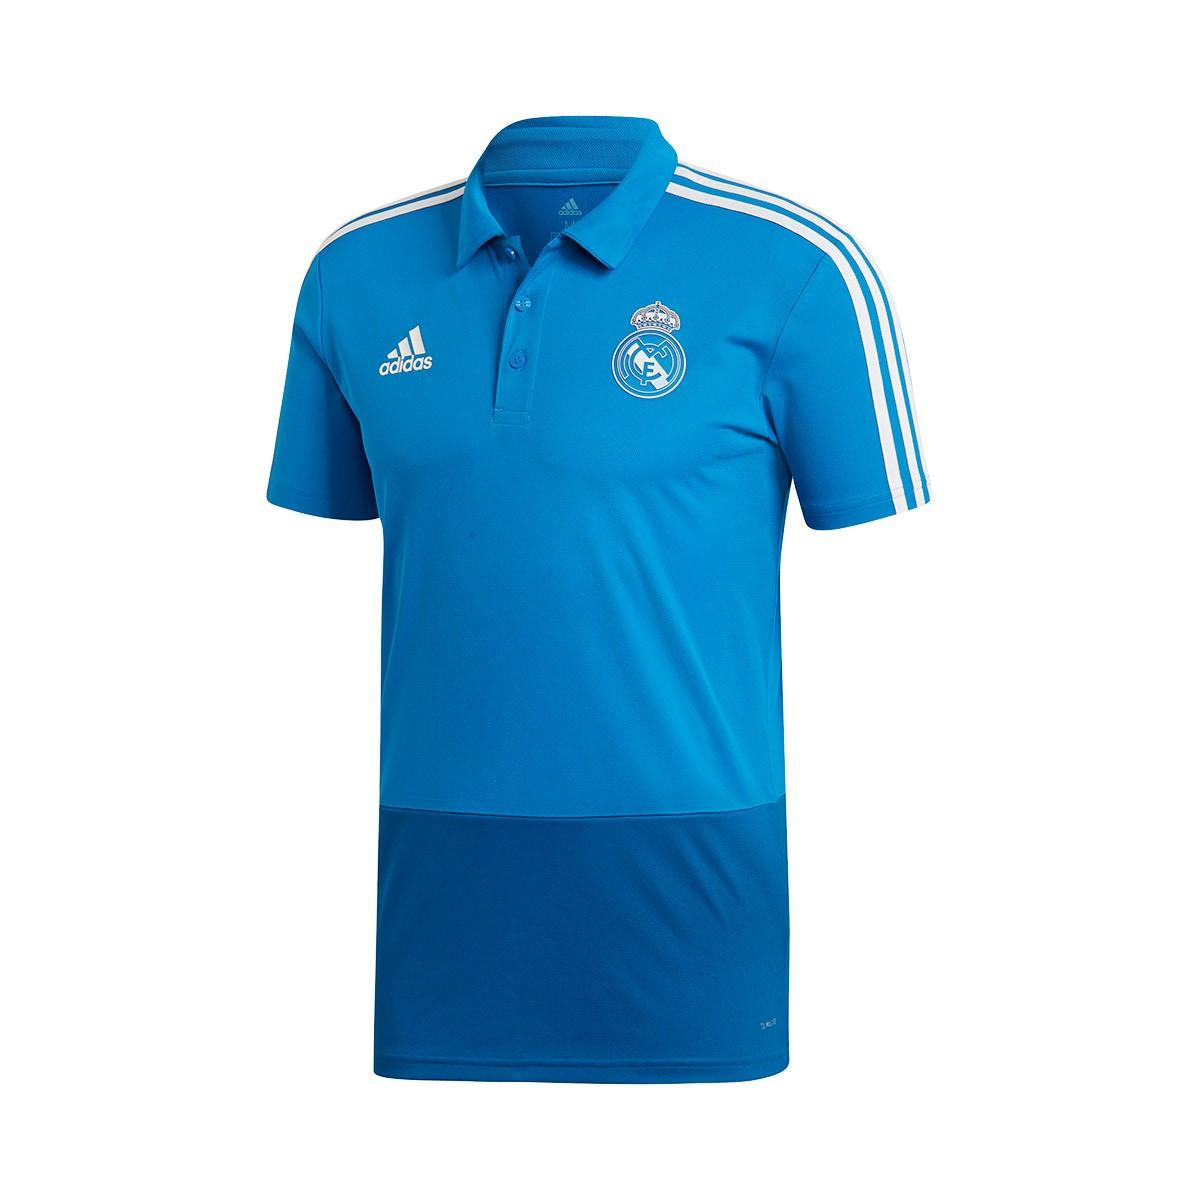 55803a97a01 Polo shirt adidas Real Madrid 2018-2019 Craft blue-Dark royal-Core ...